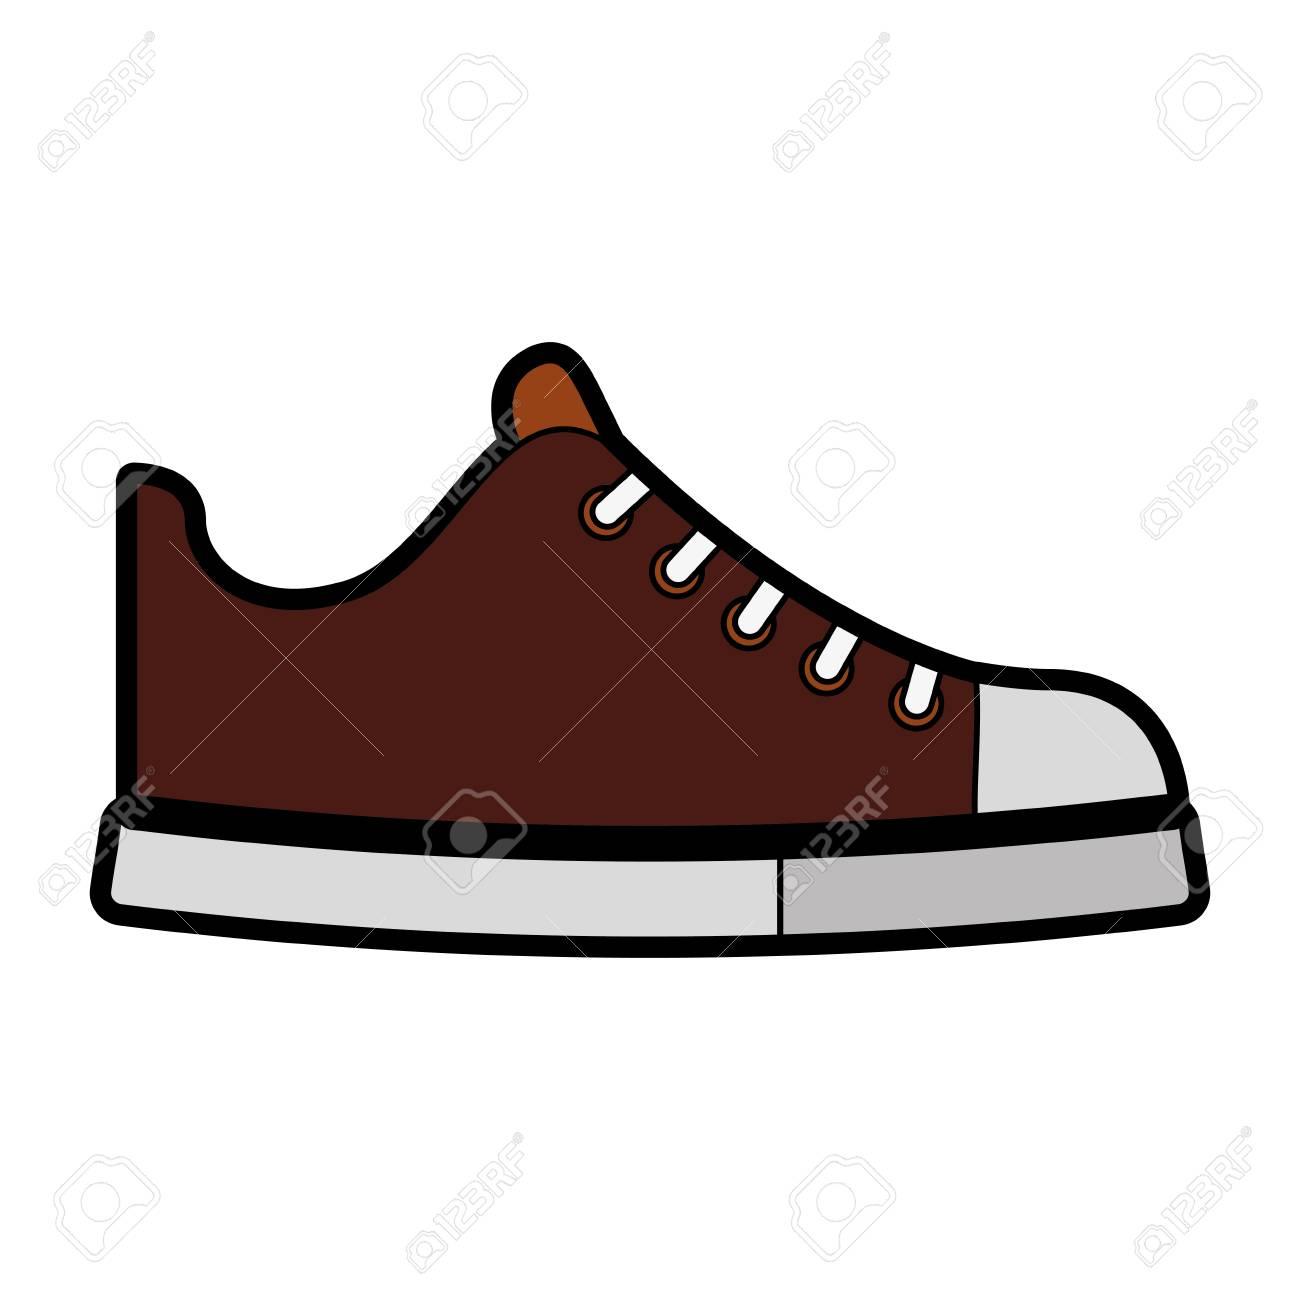 cute brown shoe cartoon vector graphic design royalty free cliparts rh 123rf com victor shoe store vector shoe print